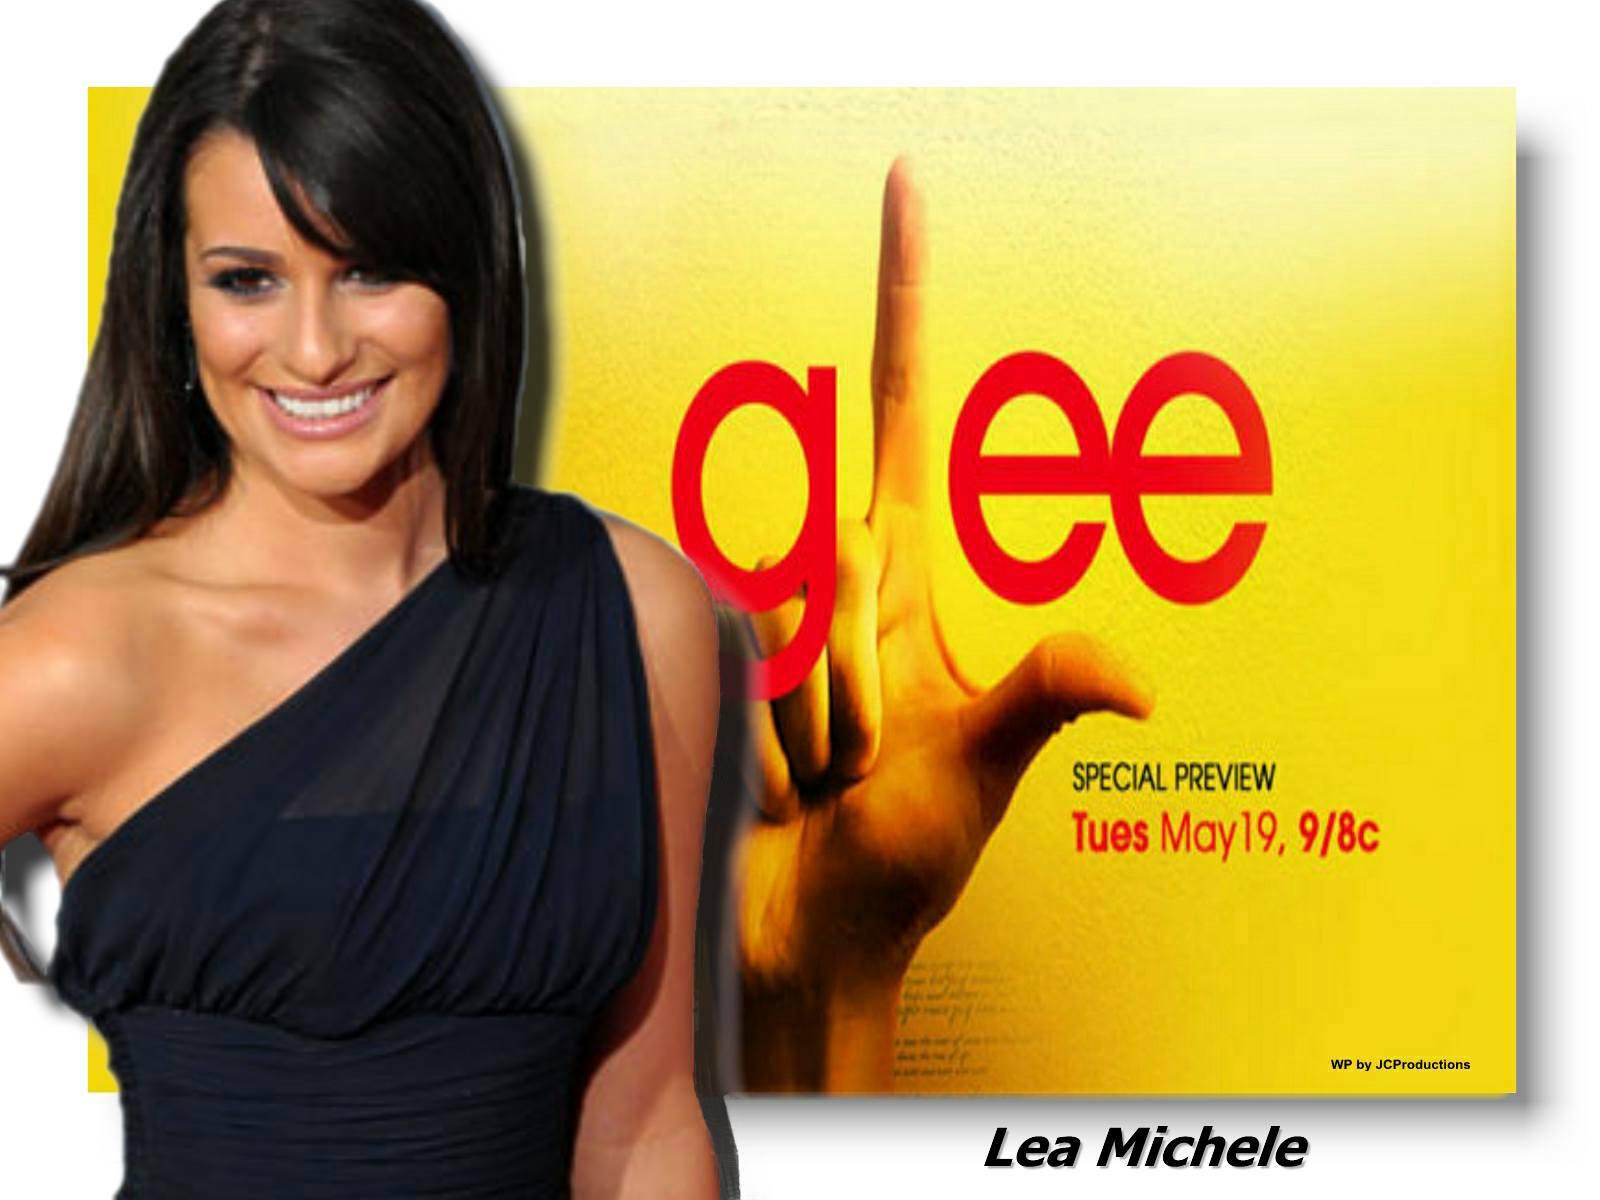 Download High quality Glee, Britney S Pierce, heather morris, lea michele, music, choir, fox 5, dianna agron Glee wallpaper / 1600x1200